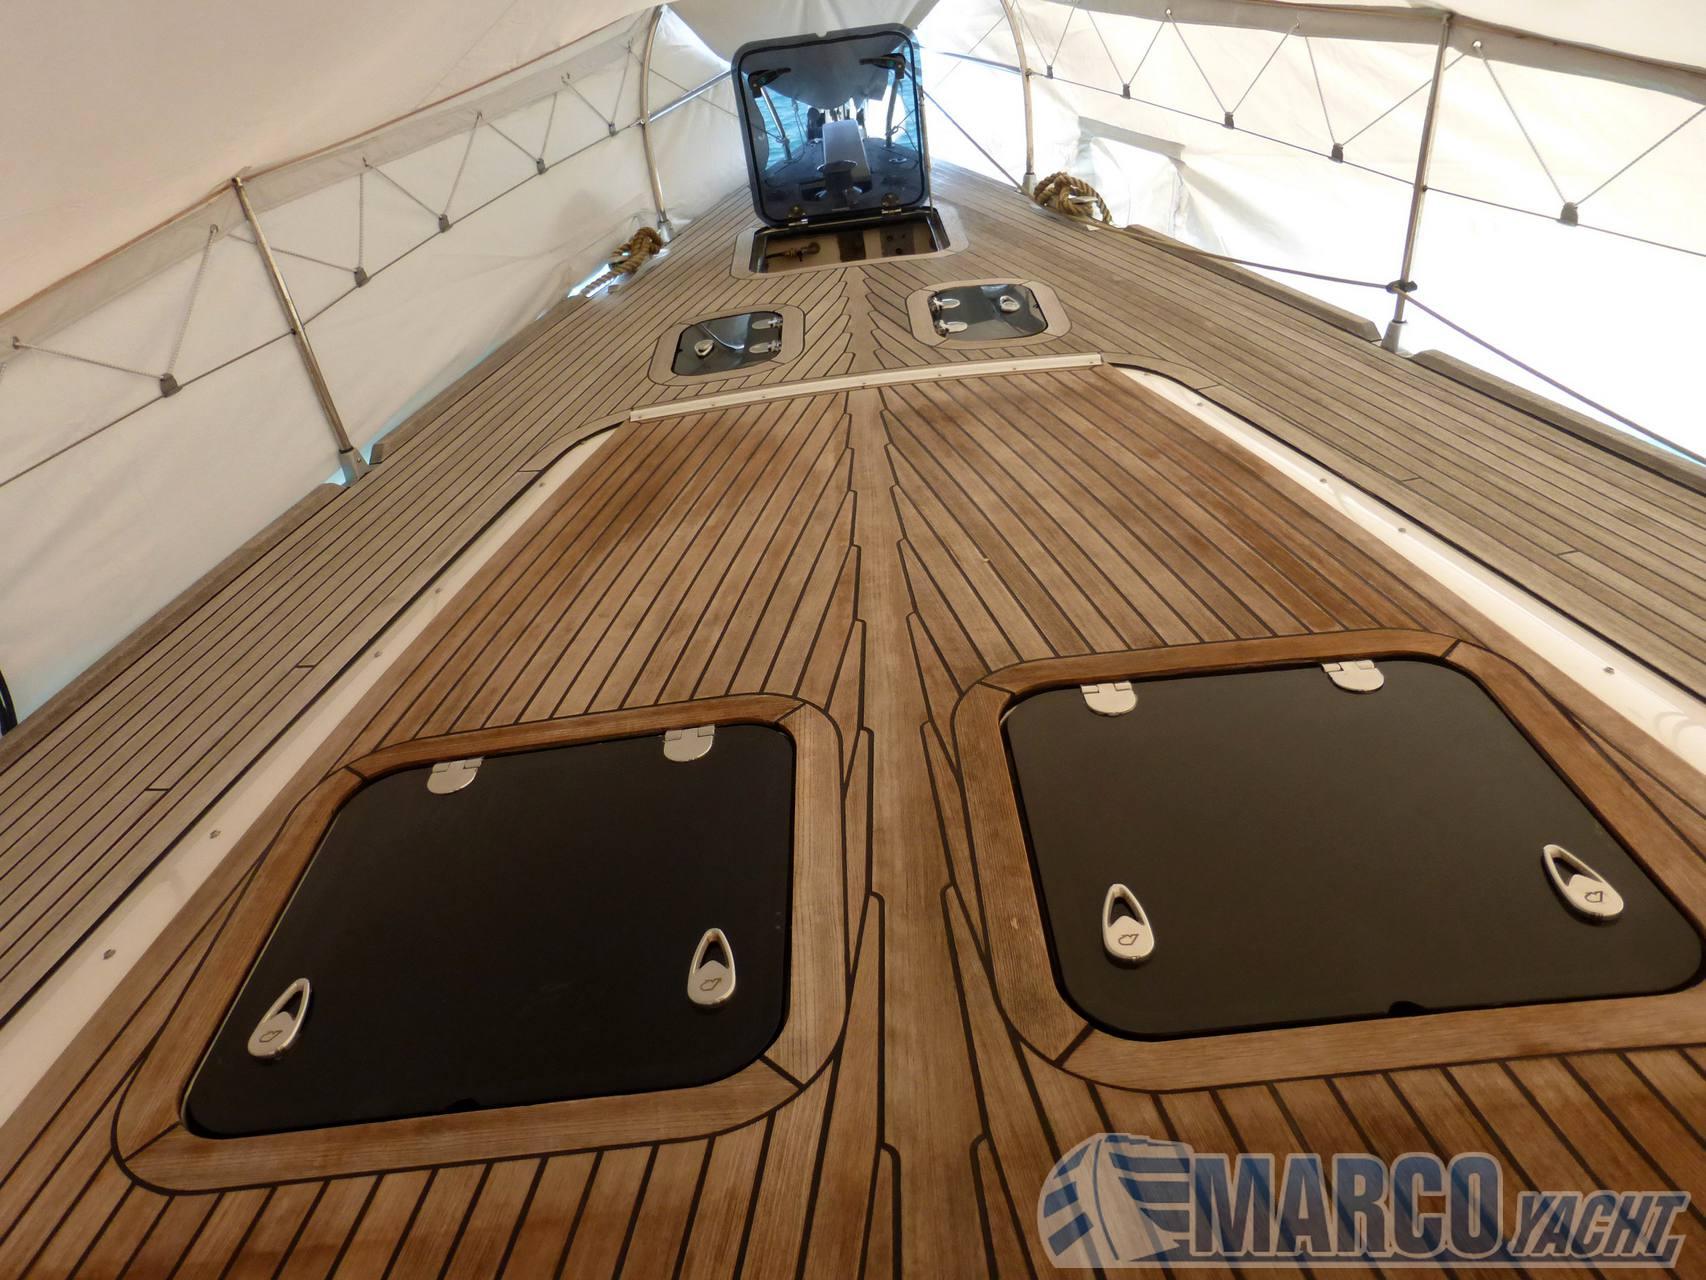 Elan 514 impression القوارب الشراعية مستعملة للبيع